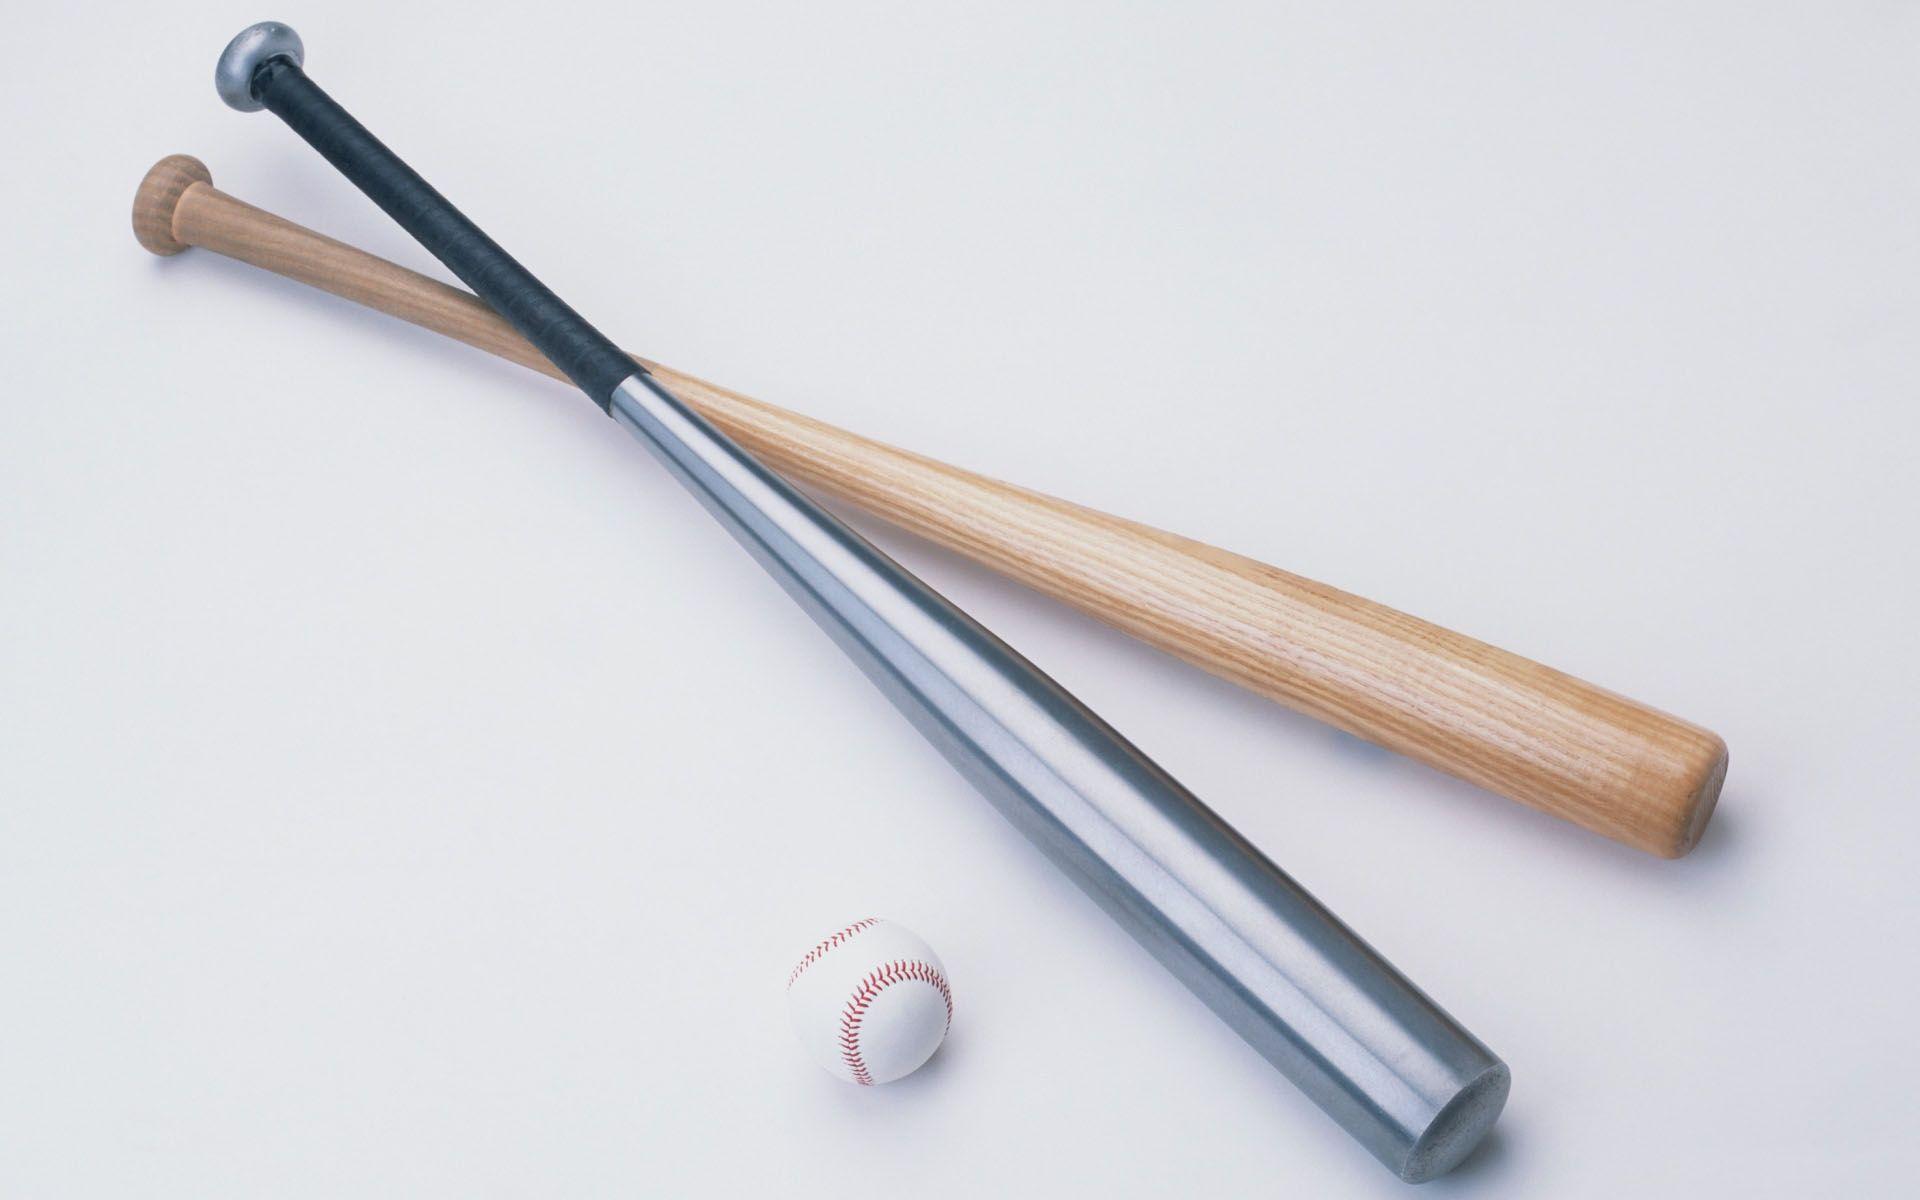 images of baseball bats | Metal baseball bat 1920x1200 Wallpapers, 1920x1200 Wallpapers ...